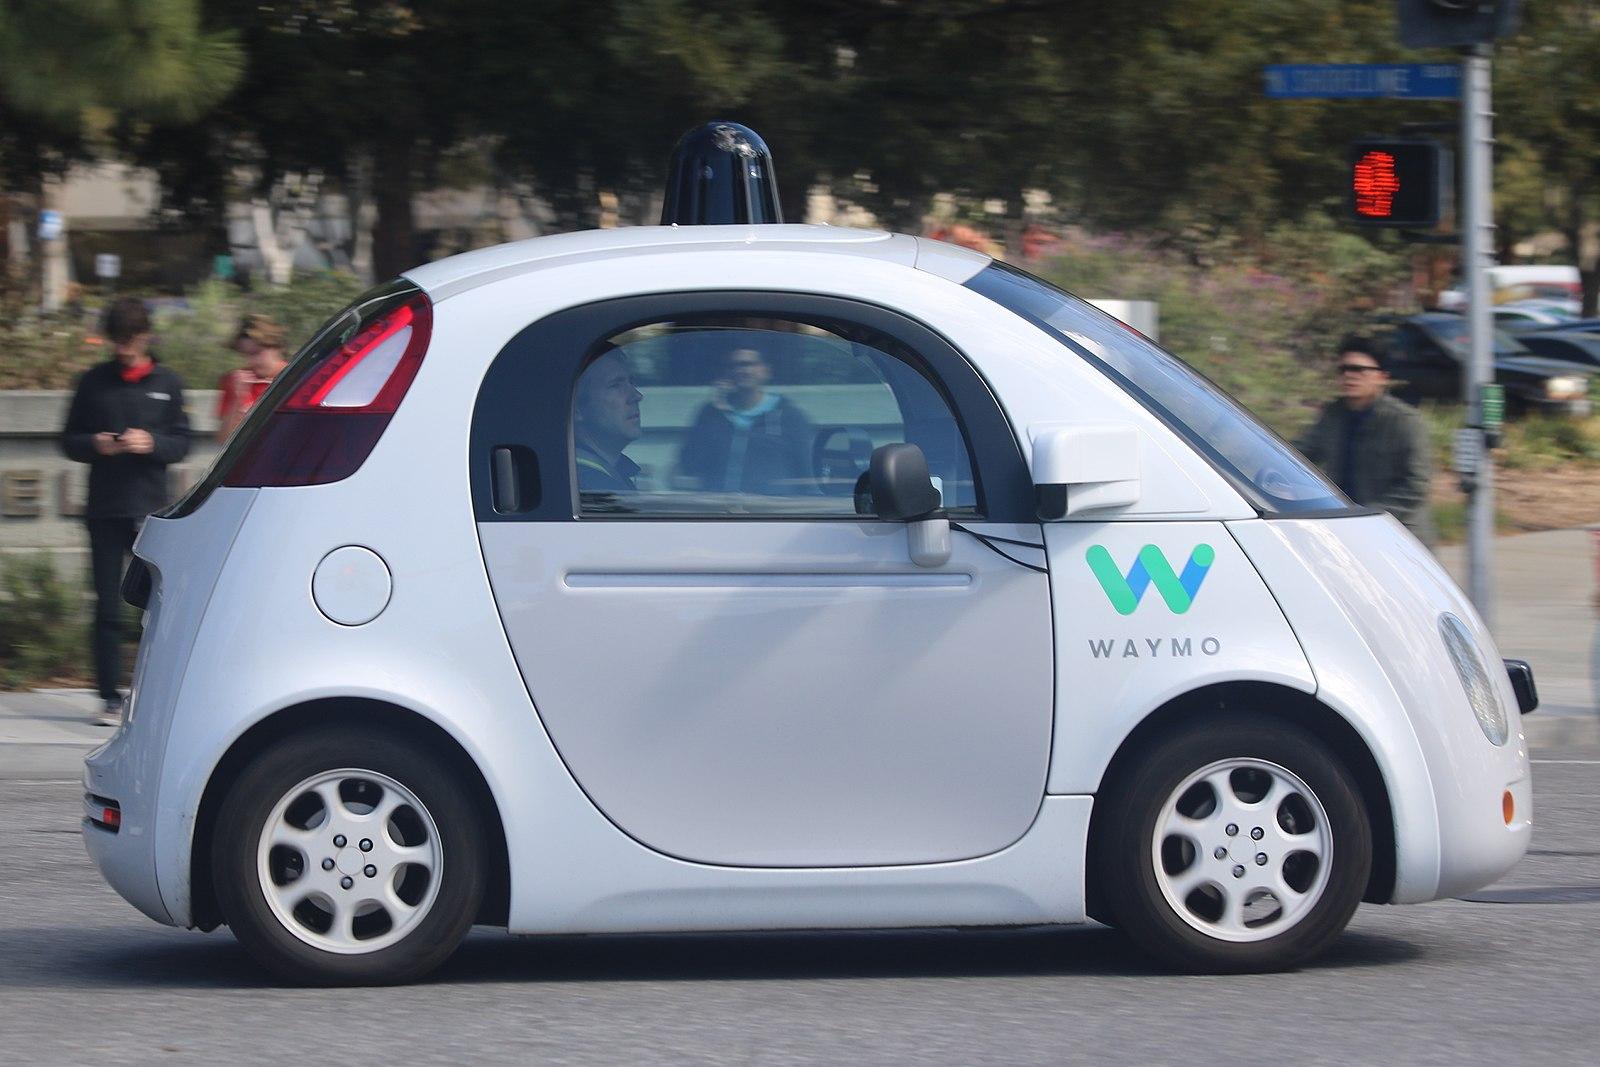 Difference Between Waymo and Tesla